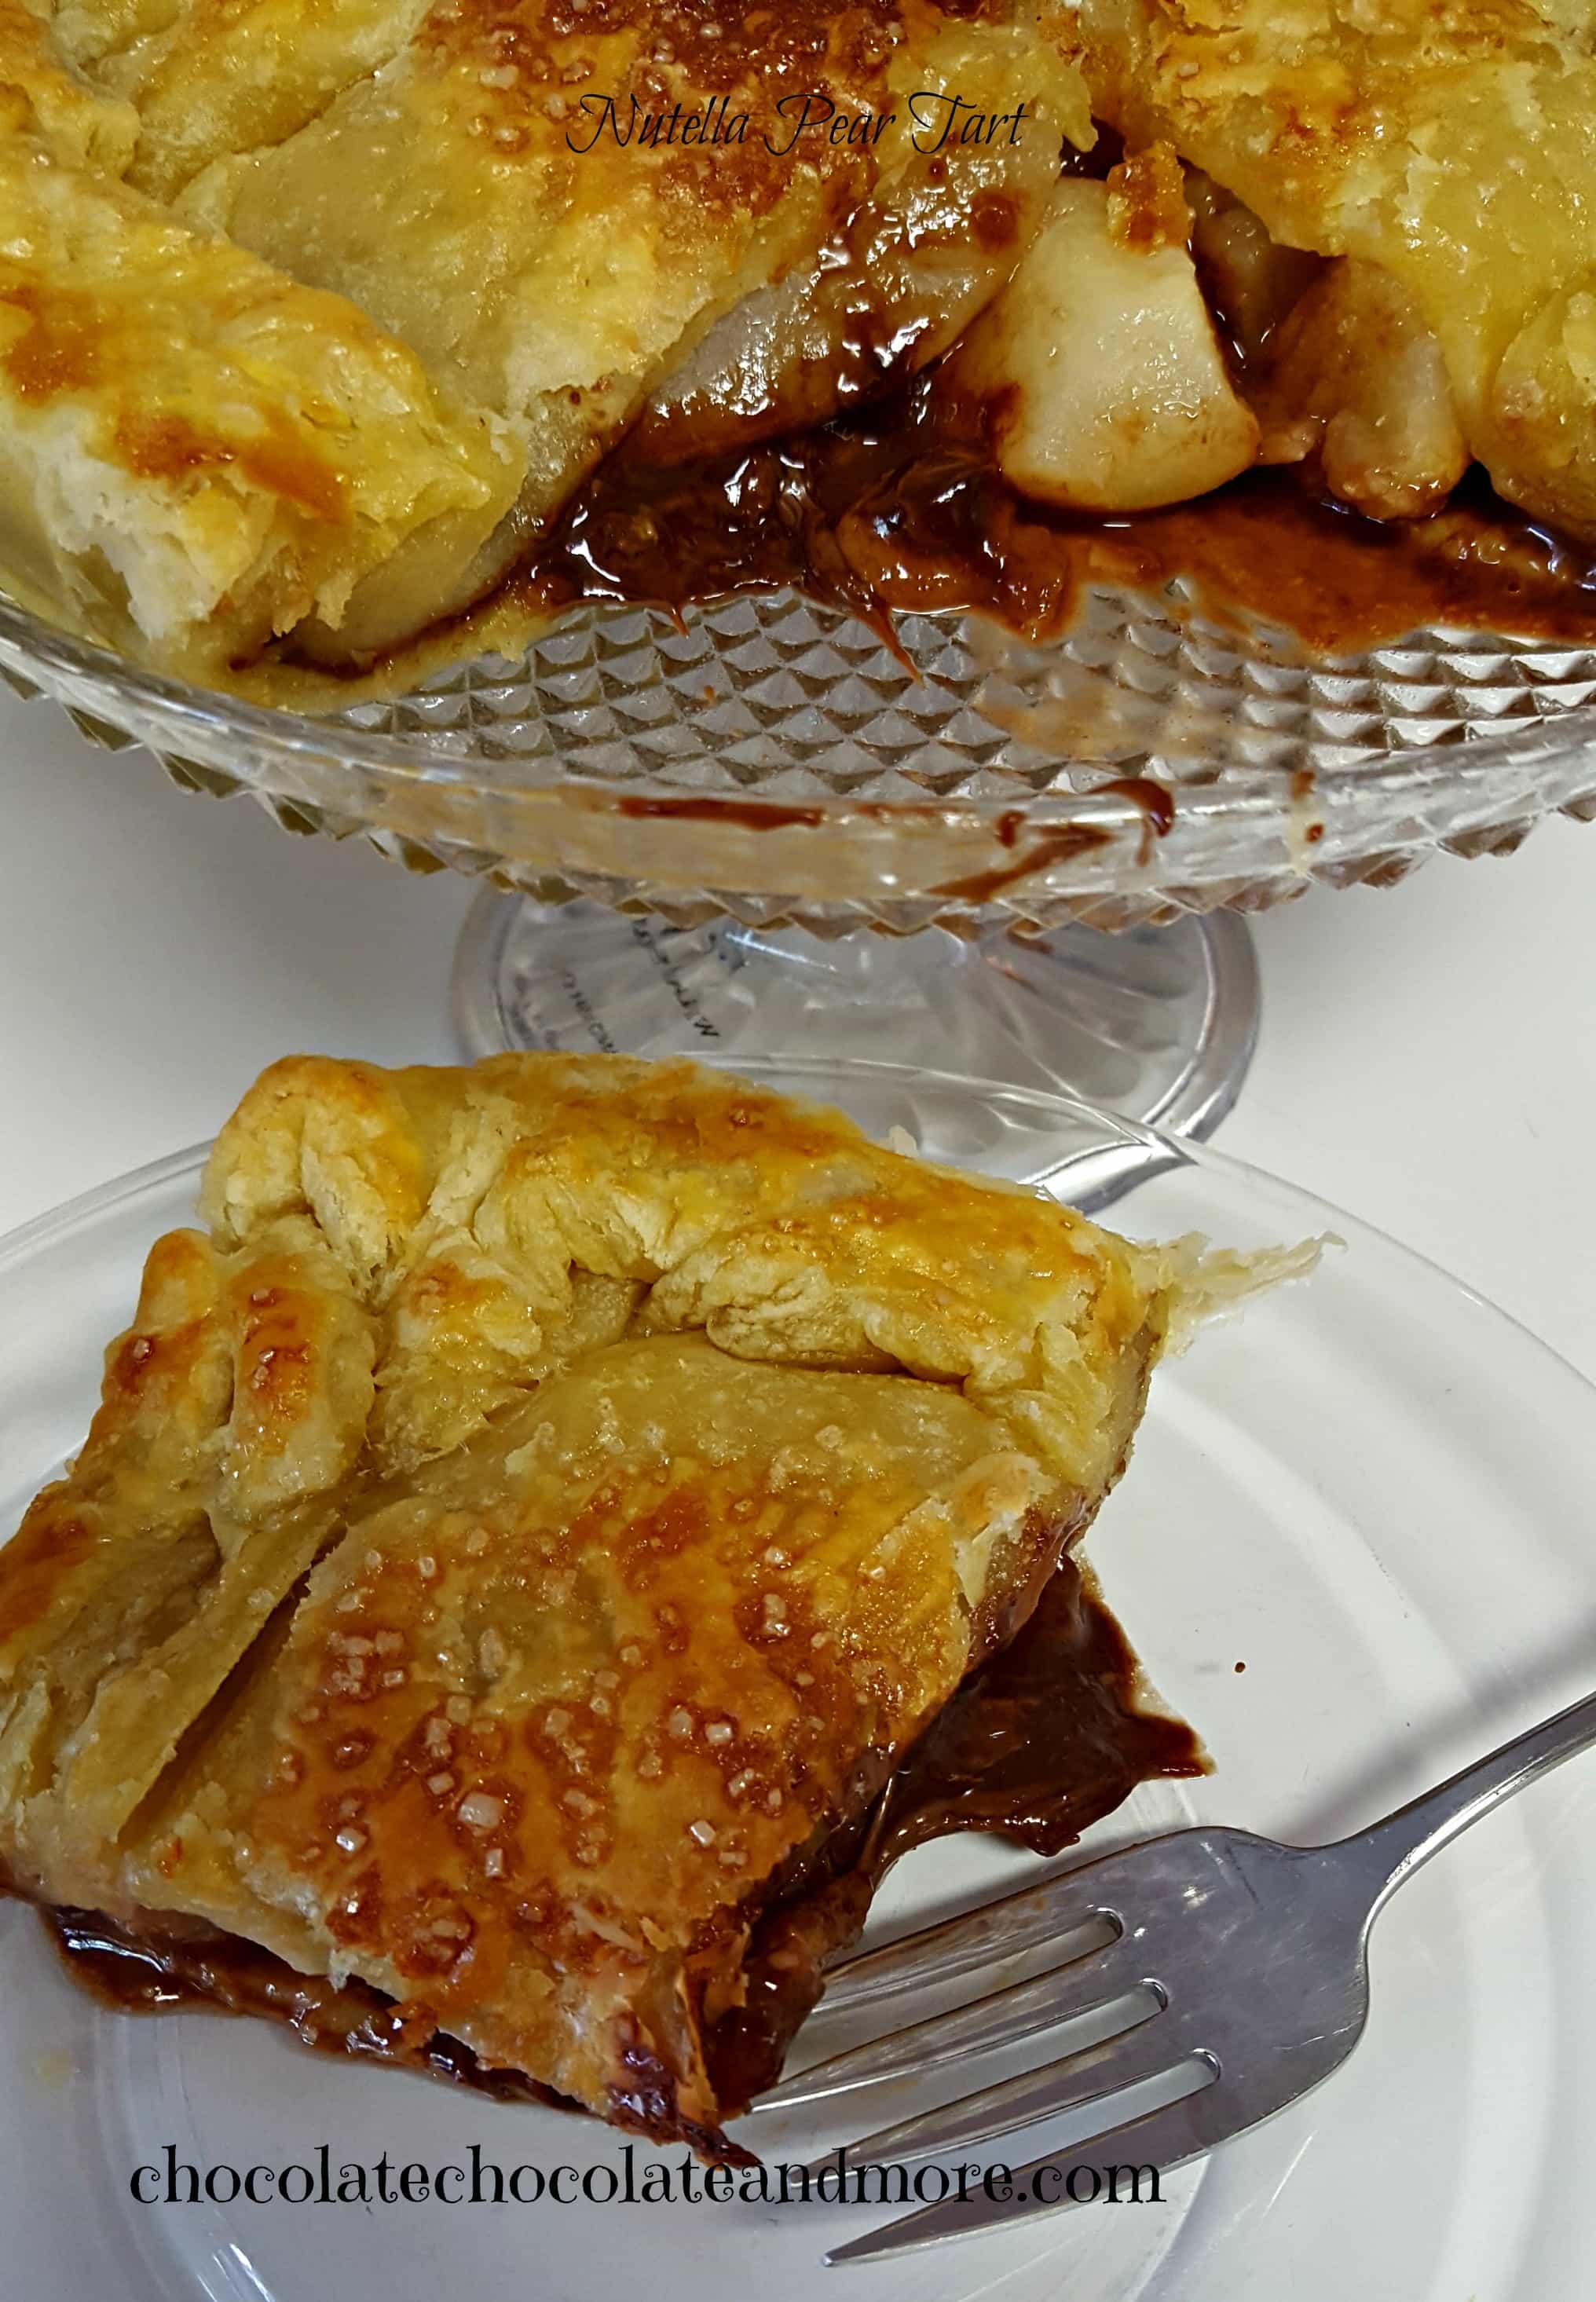 Nutella Pear Tart